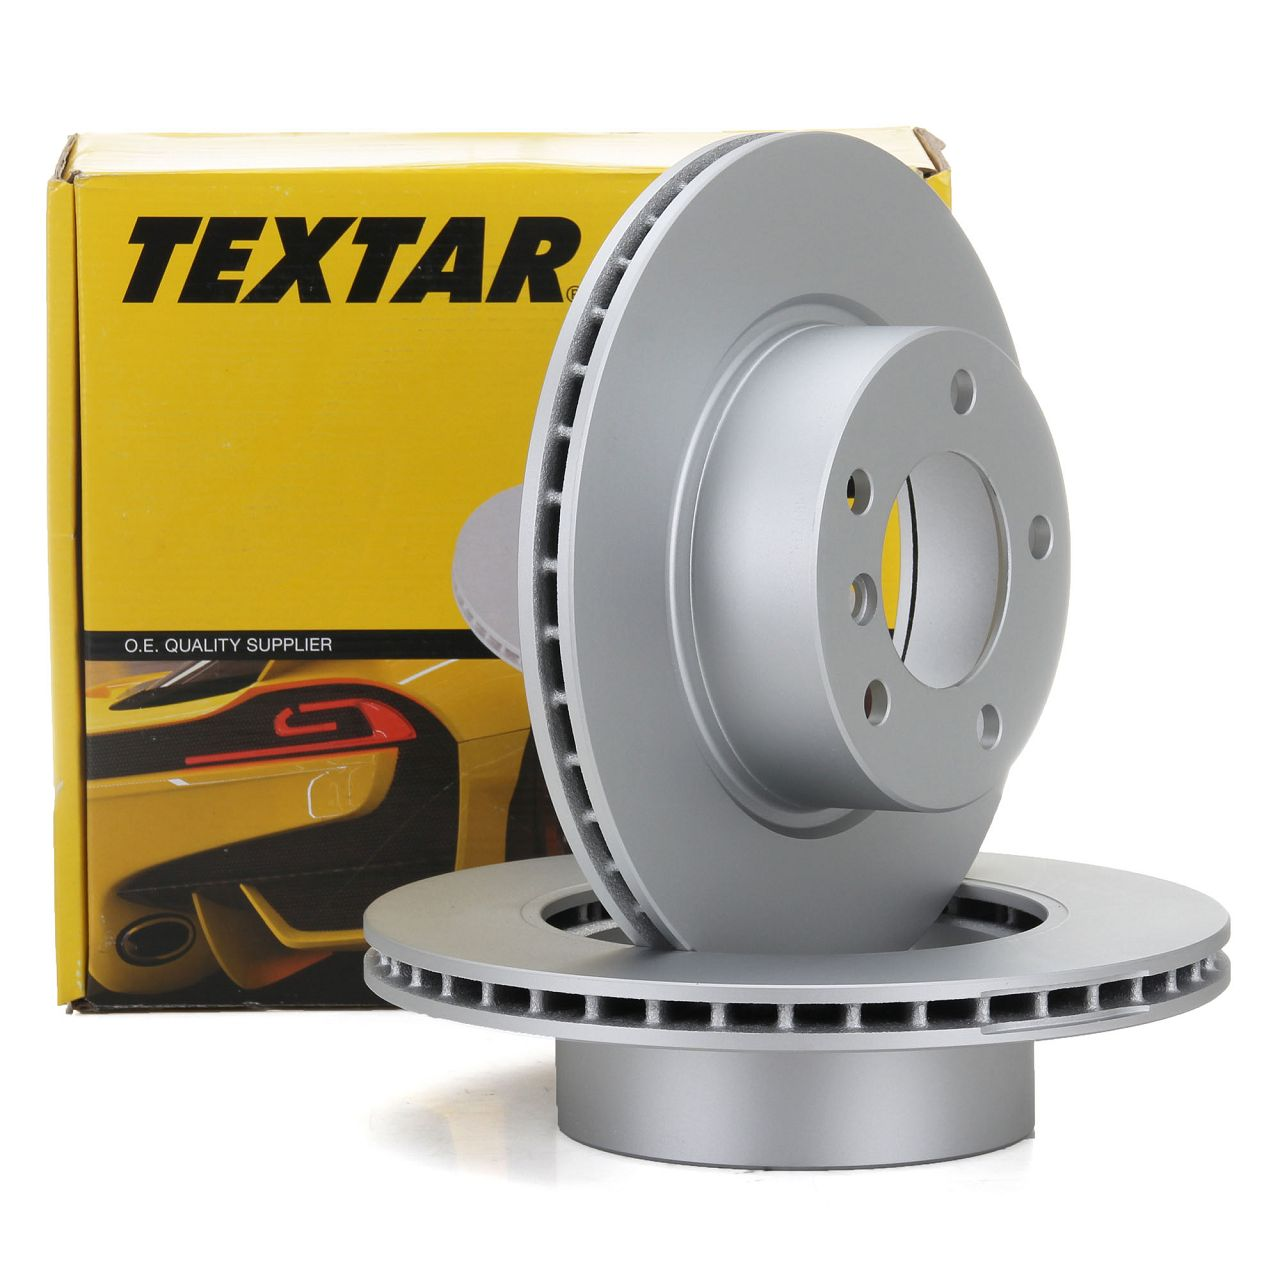 TEXTAR 92132805 Bremsscheiben Satz BMW 1er E81 E87 E88 E82 3er E90 ohne M-Technik vorne